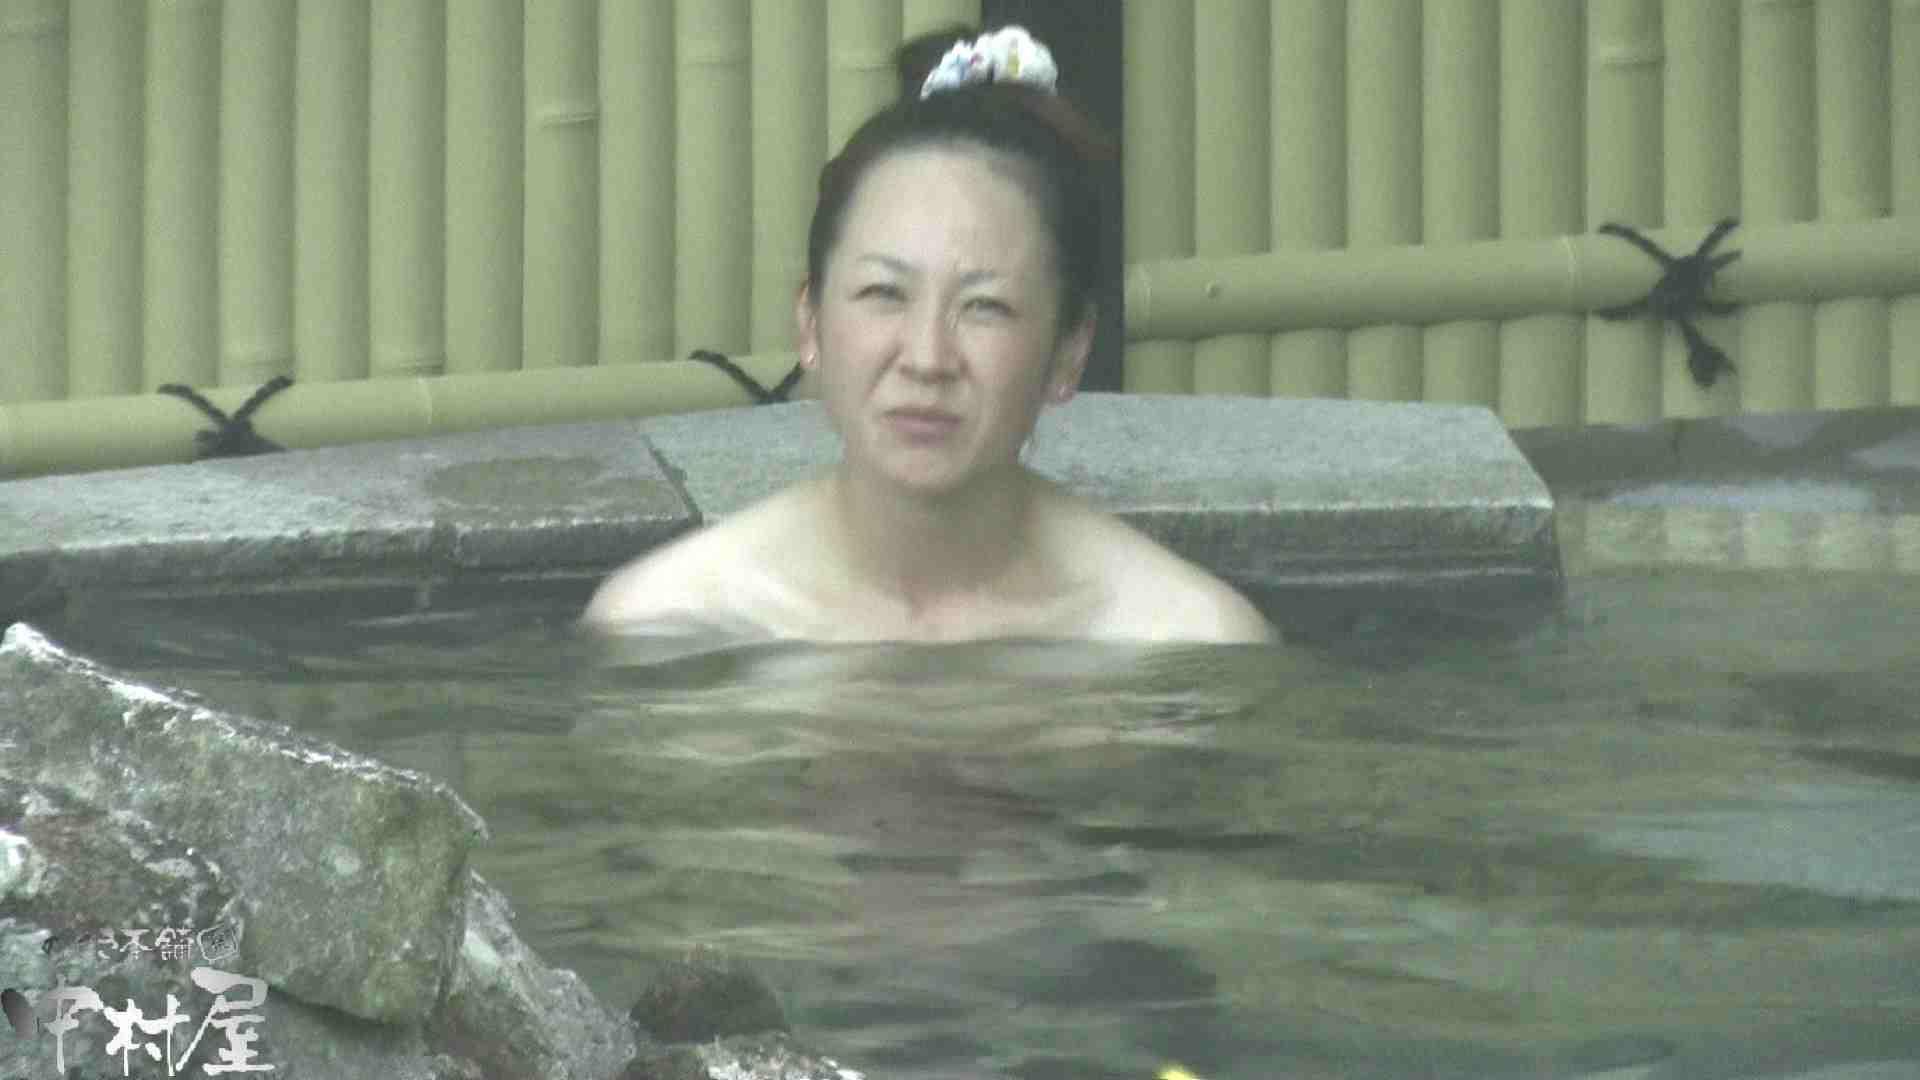 Aquaな露天風呂Vol.911 0   0  88連発 25